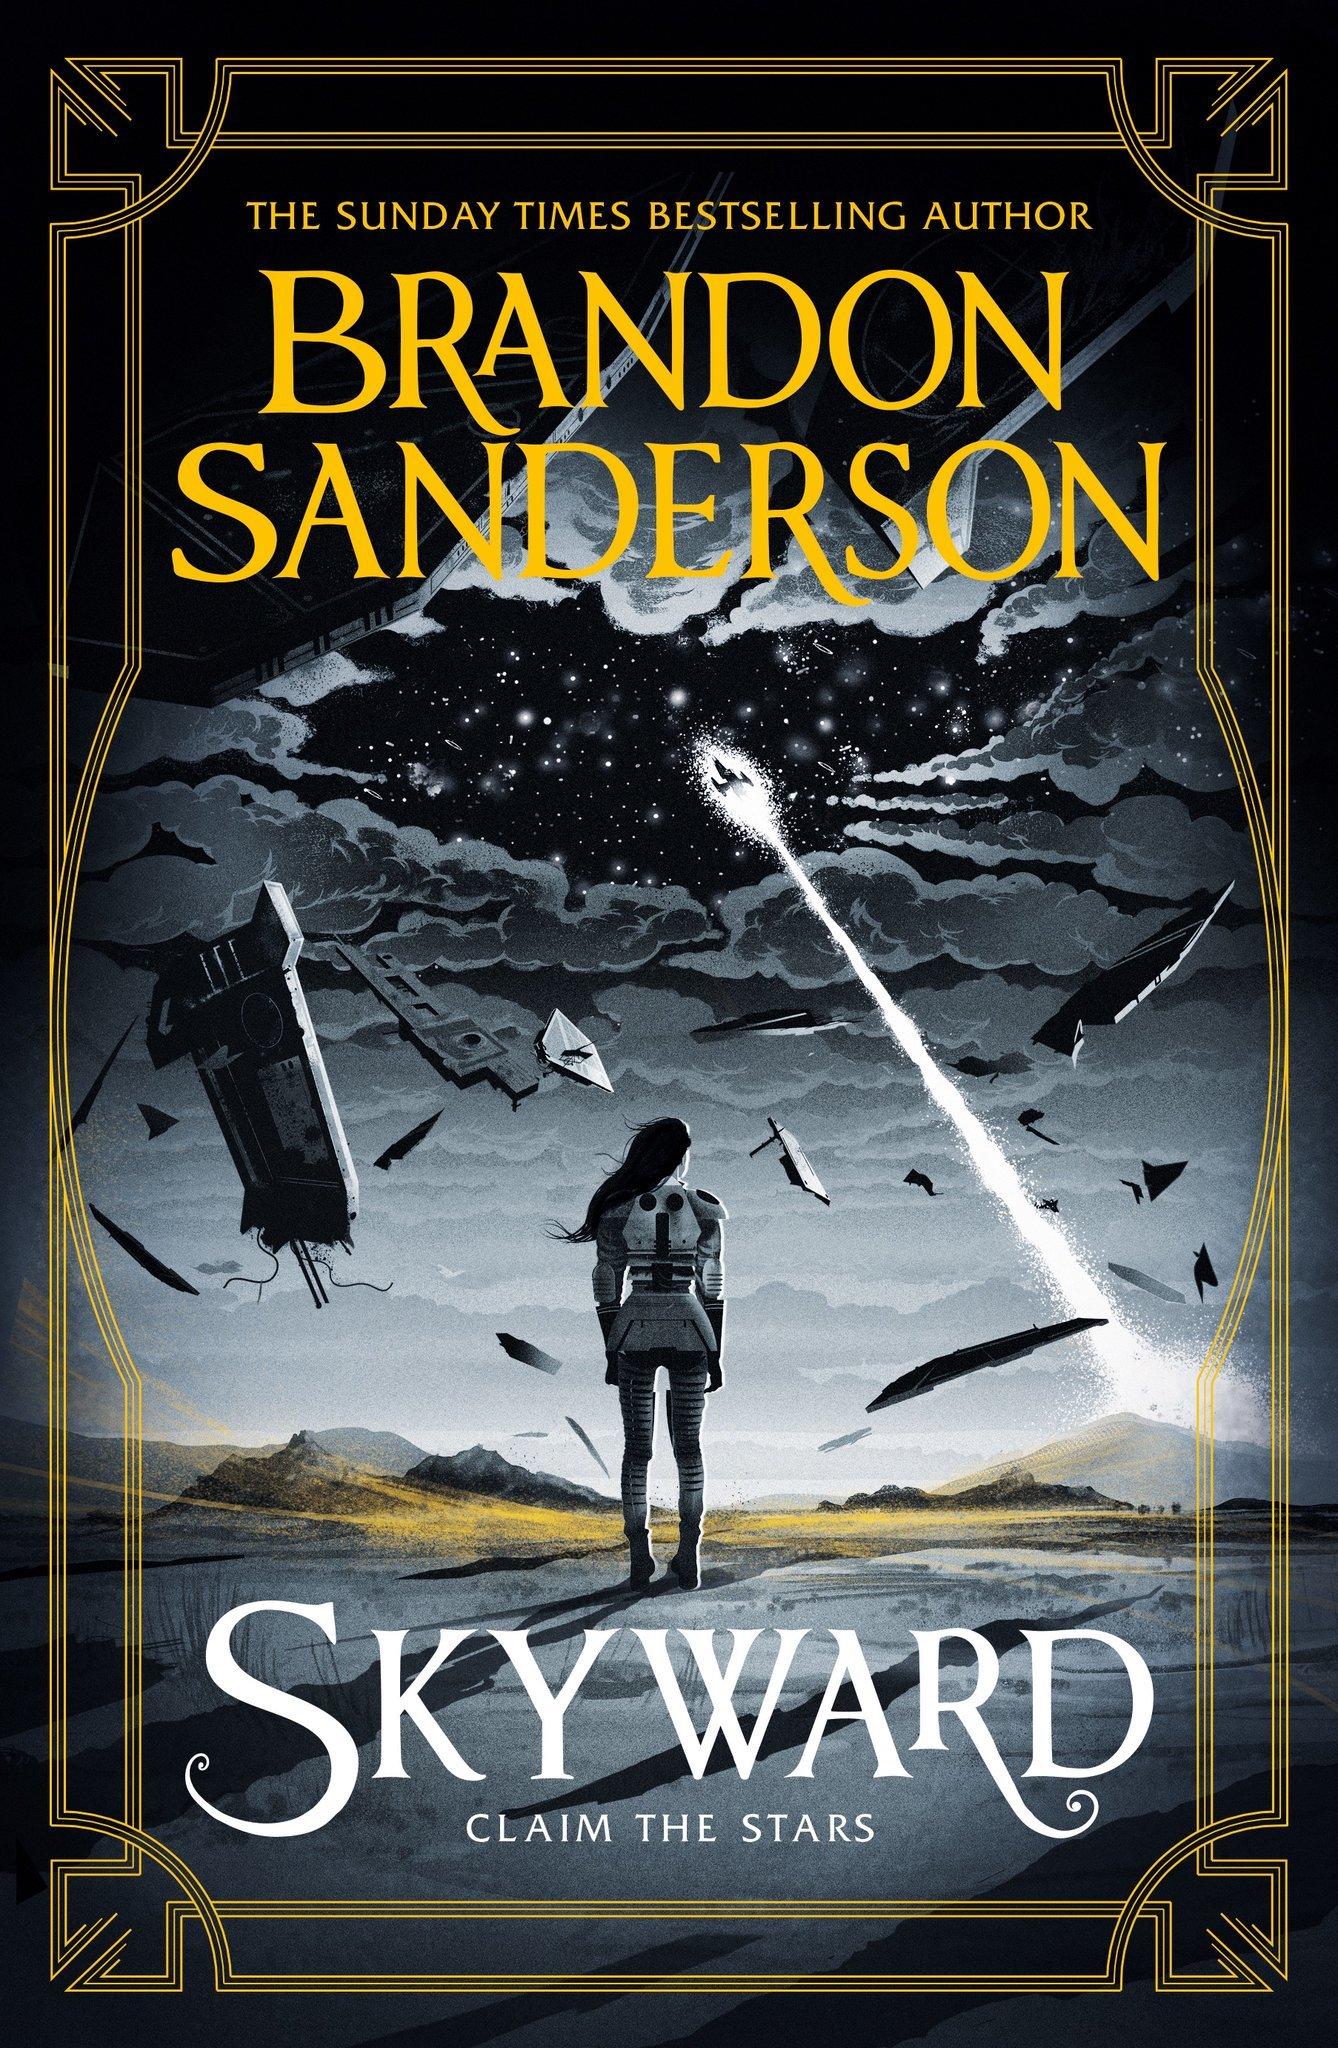 Sanderson, Brandon - Skyward by Sanderson Brandon